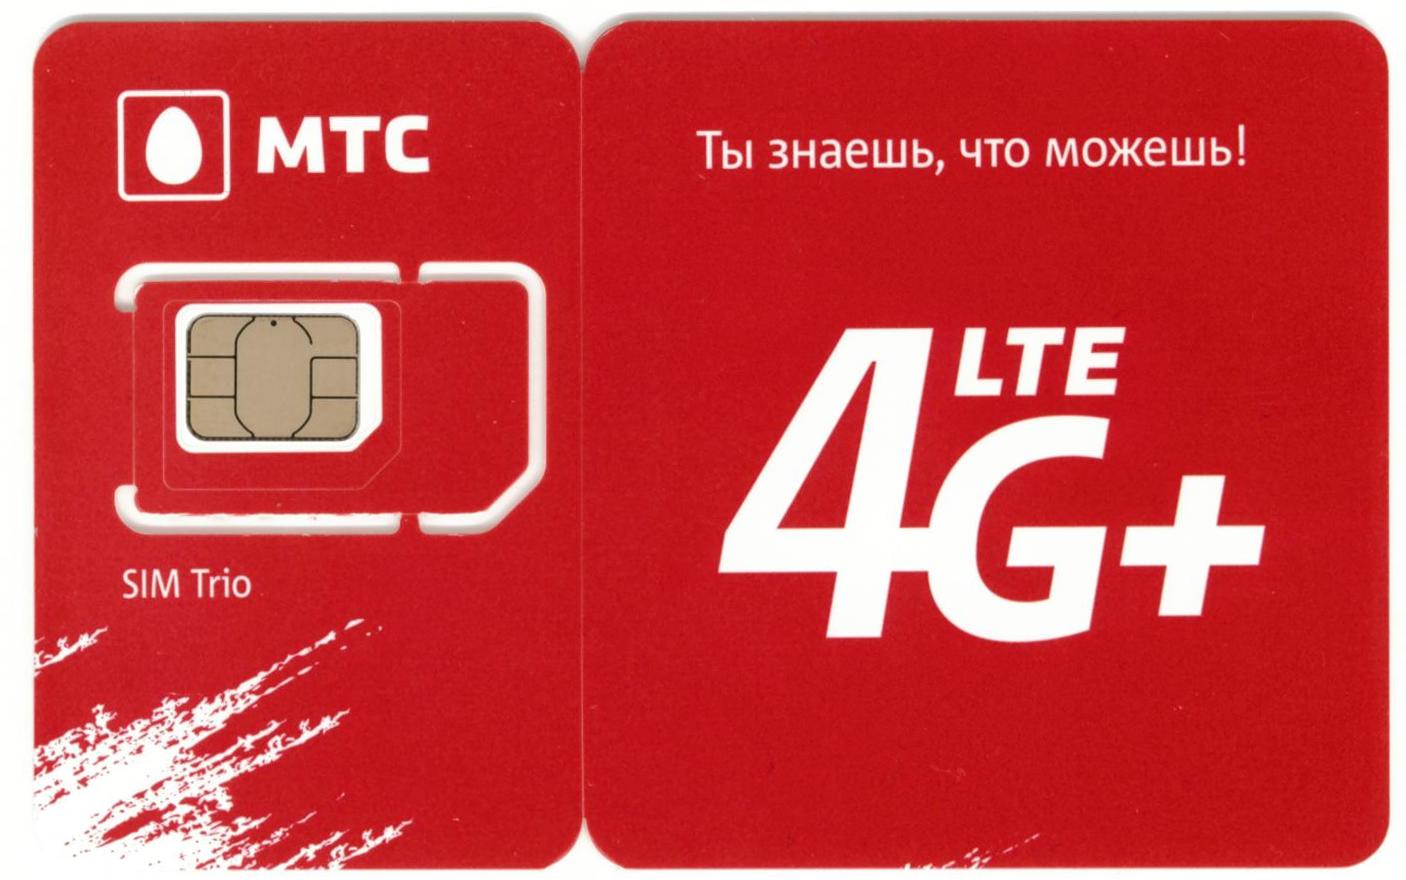 mts-sim-karte-drei-tarife-1s